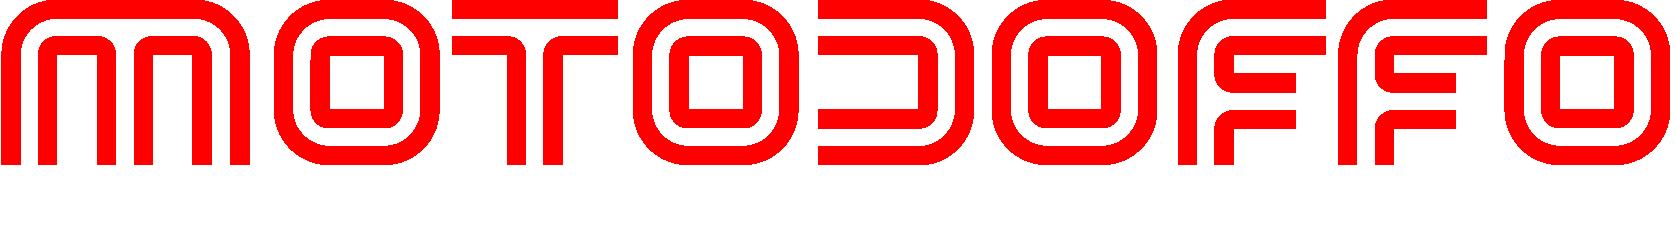 Motodoffo